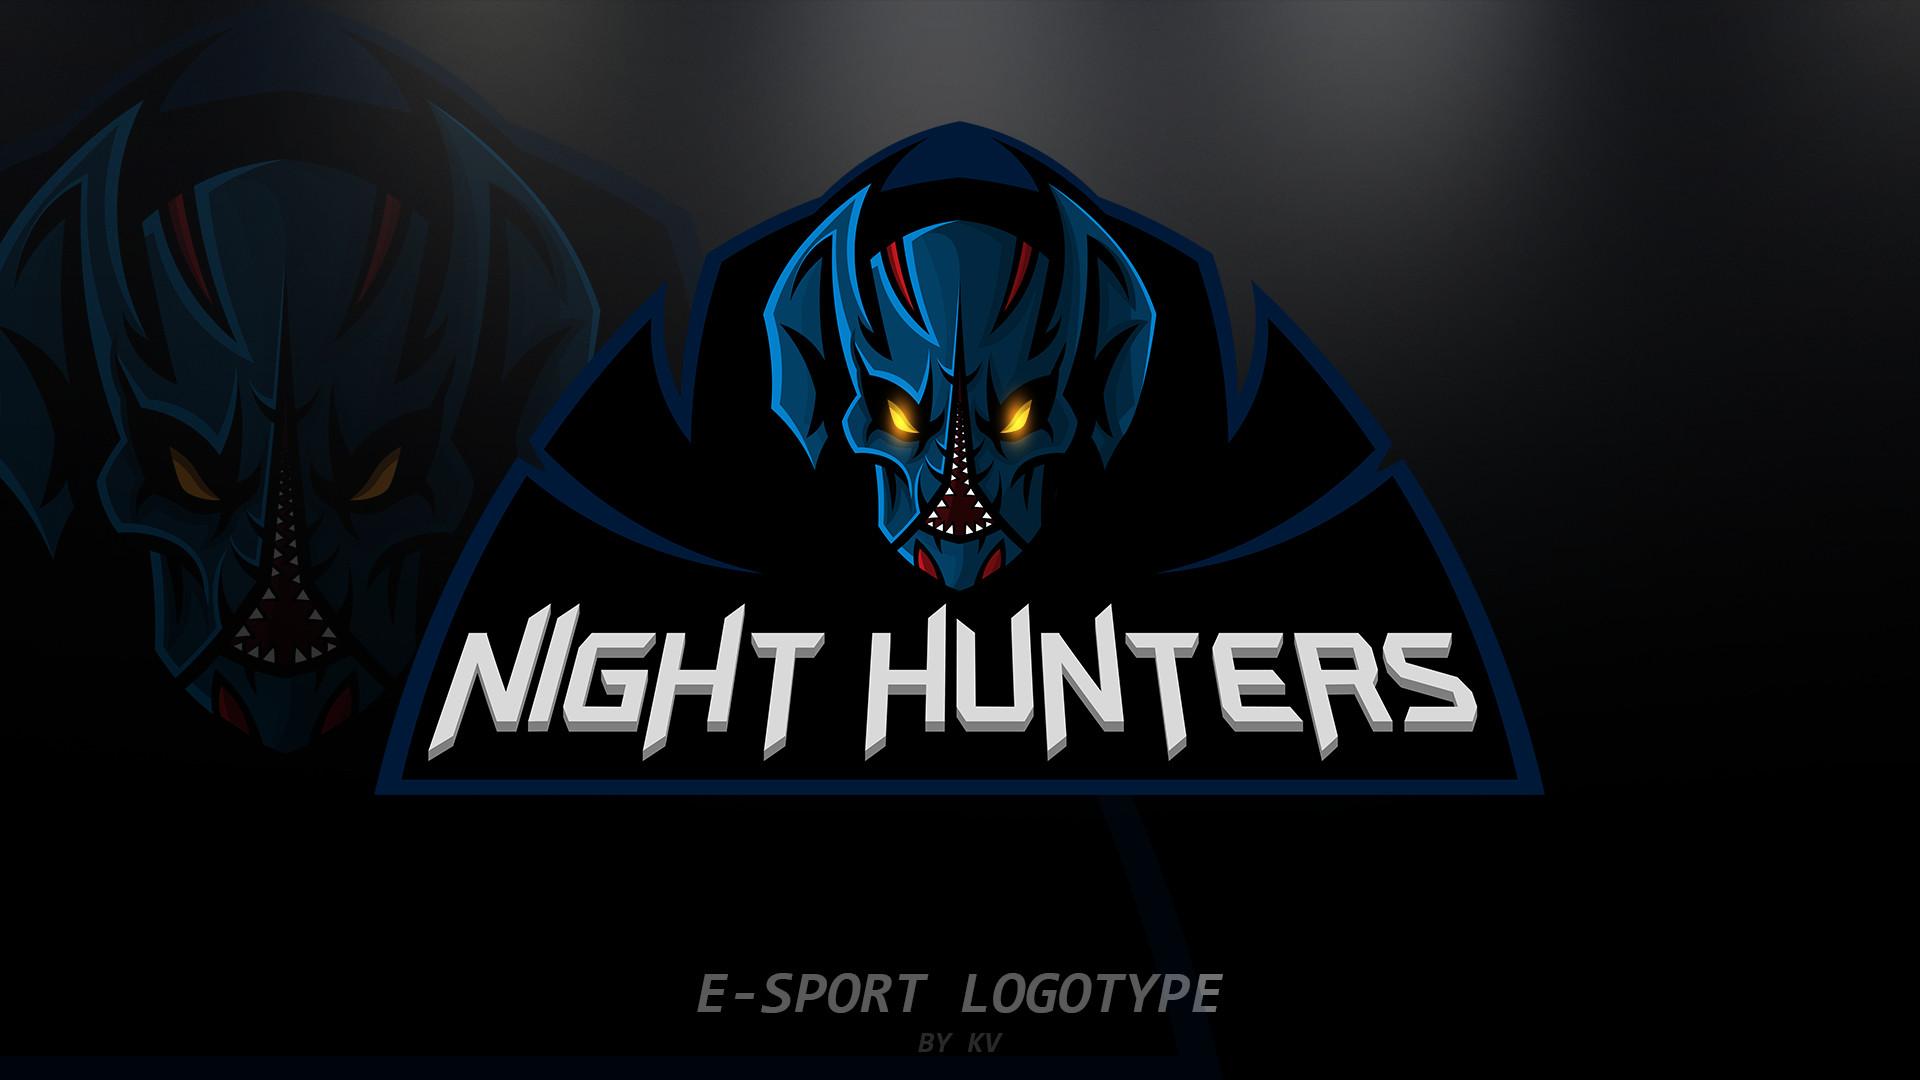 𝕍𝔸𝔻𝕀𝕄 𝕂𝕆𝕊𝔸ℝ𝔼𝕍 night hunters dota 2 e sport logo